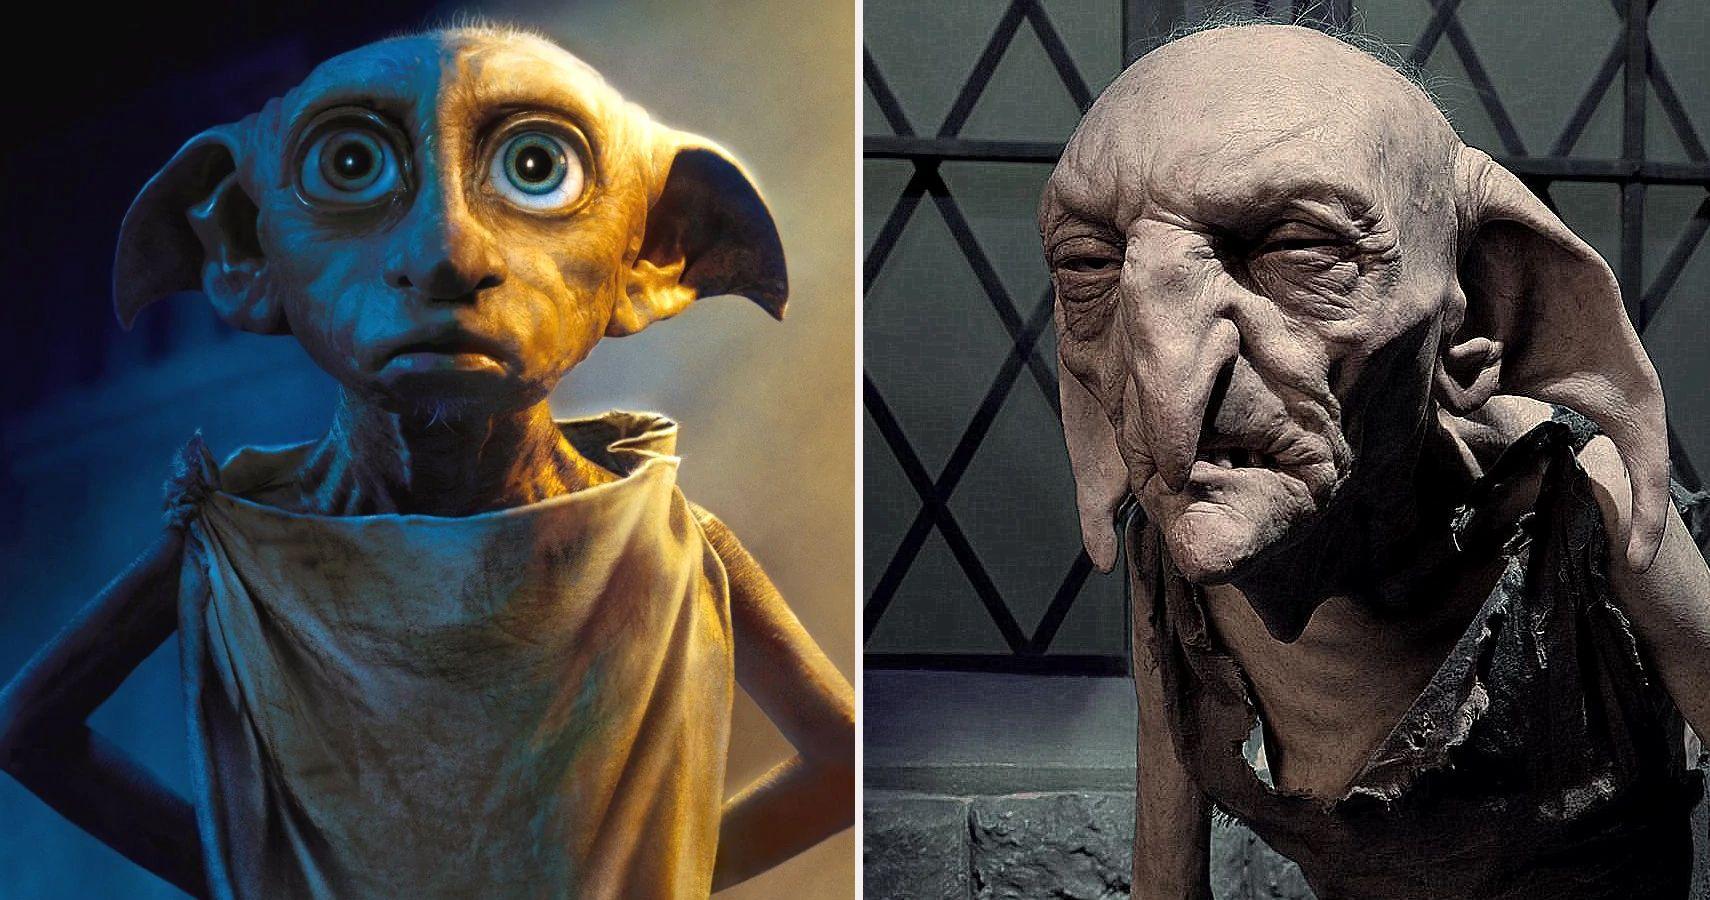 Harry Potter 10 Hidden Details About House Elves You Probably Missed